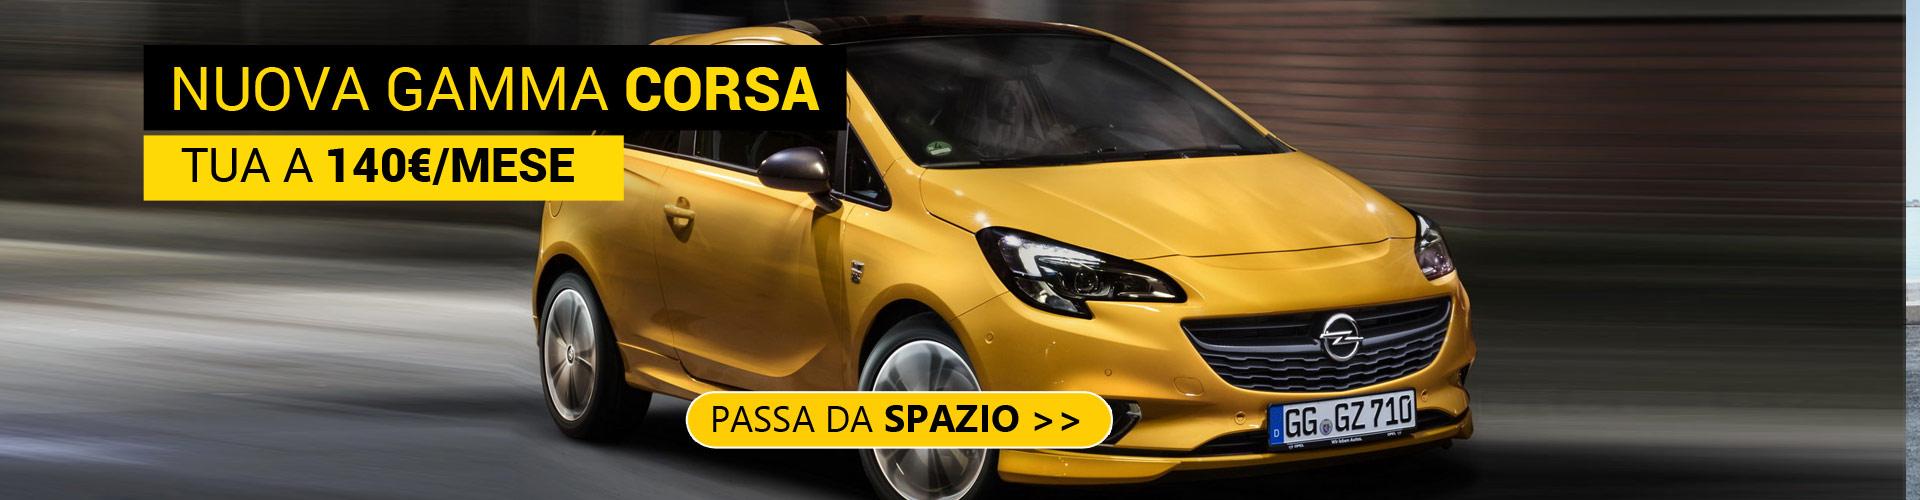 Concessionaria Opel a Torino. Spazio Group